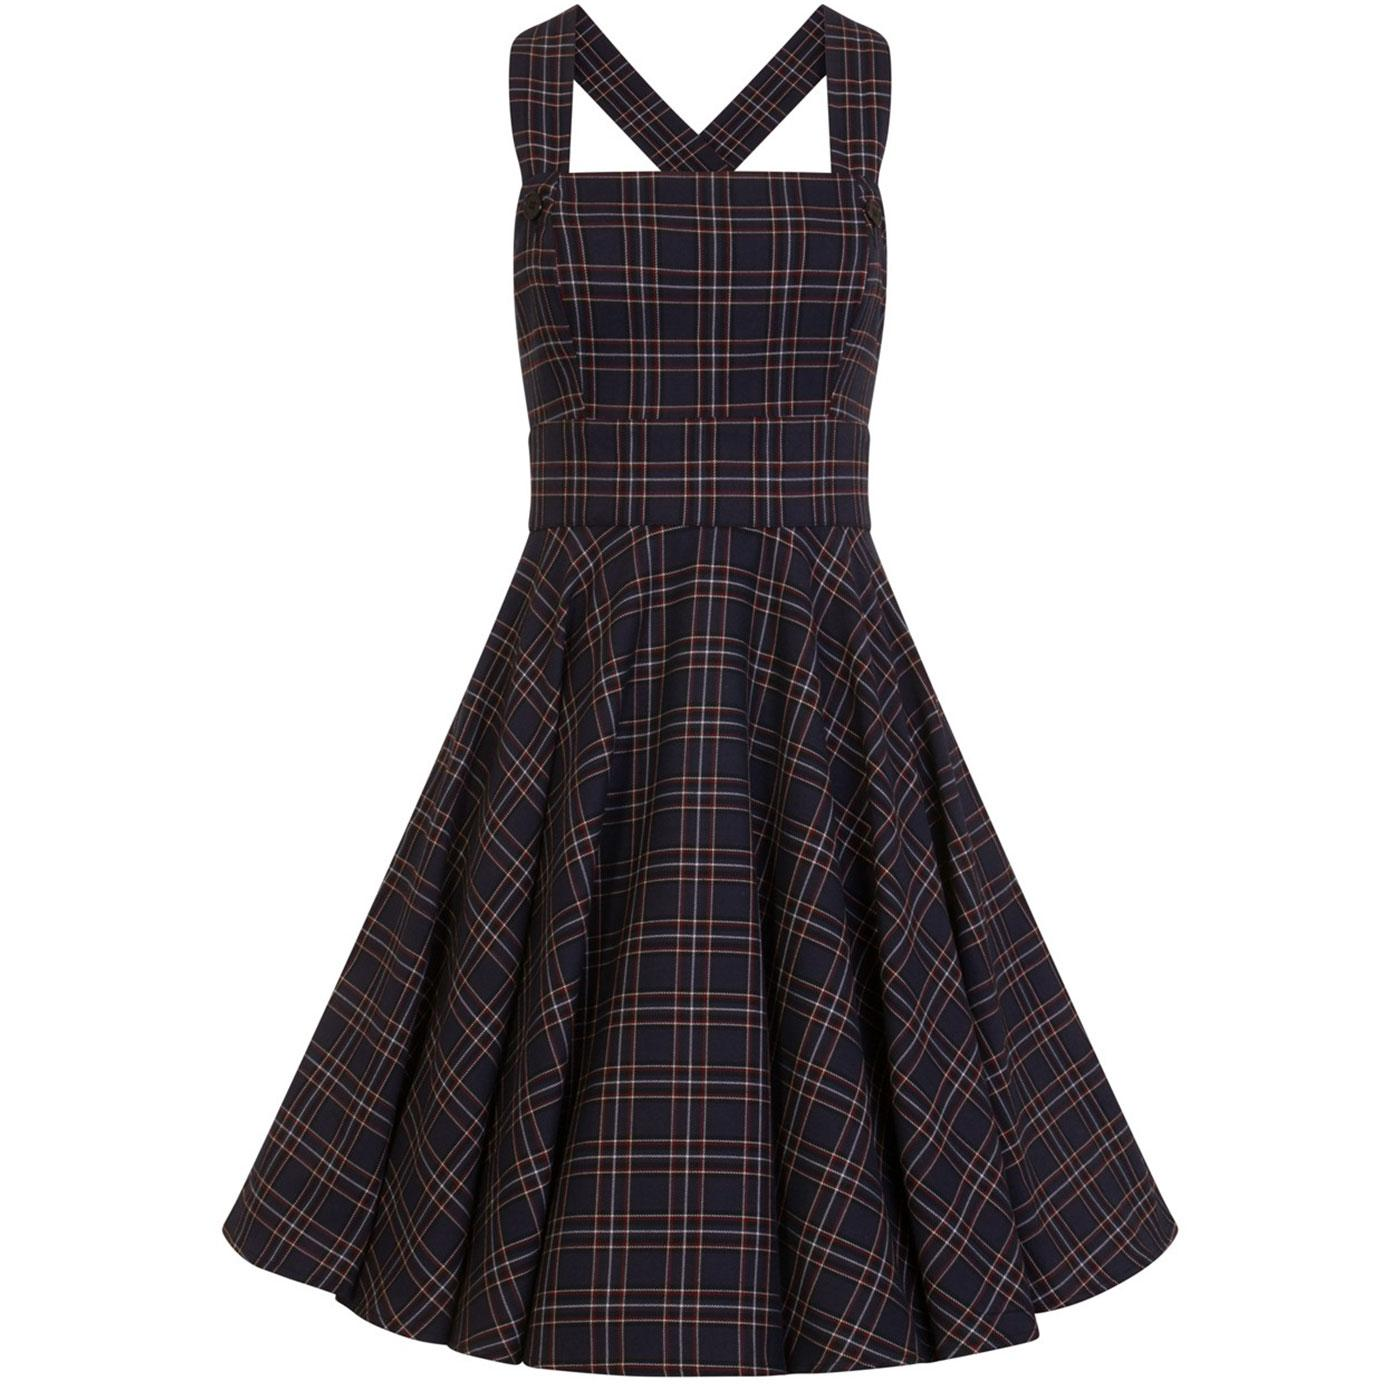 Peebles HELL BUNNY 1950's Tartan Pinafore Dress